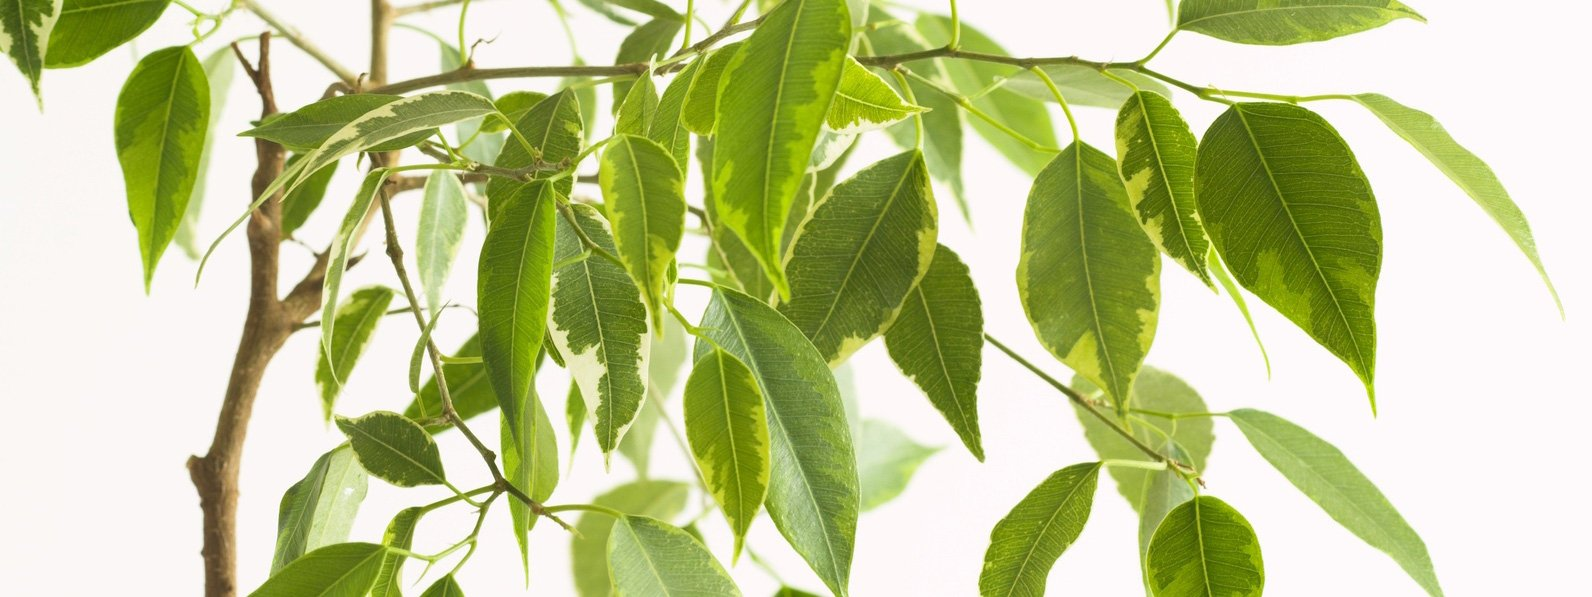 Ficus Benjamin Perde Foglie se il ficus perde le foglie: cure, controllo cocciniglia